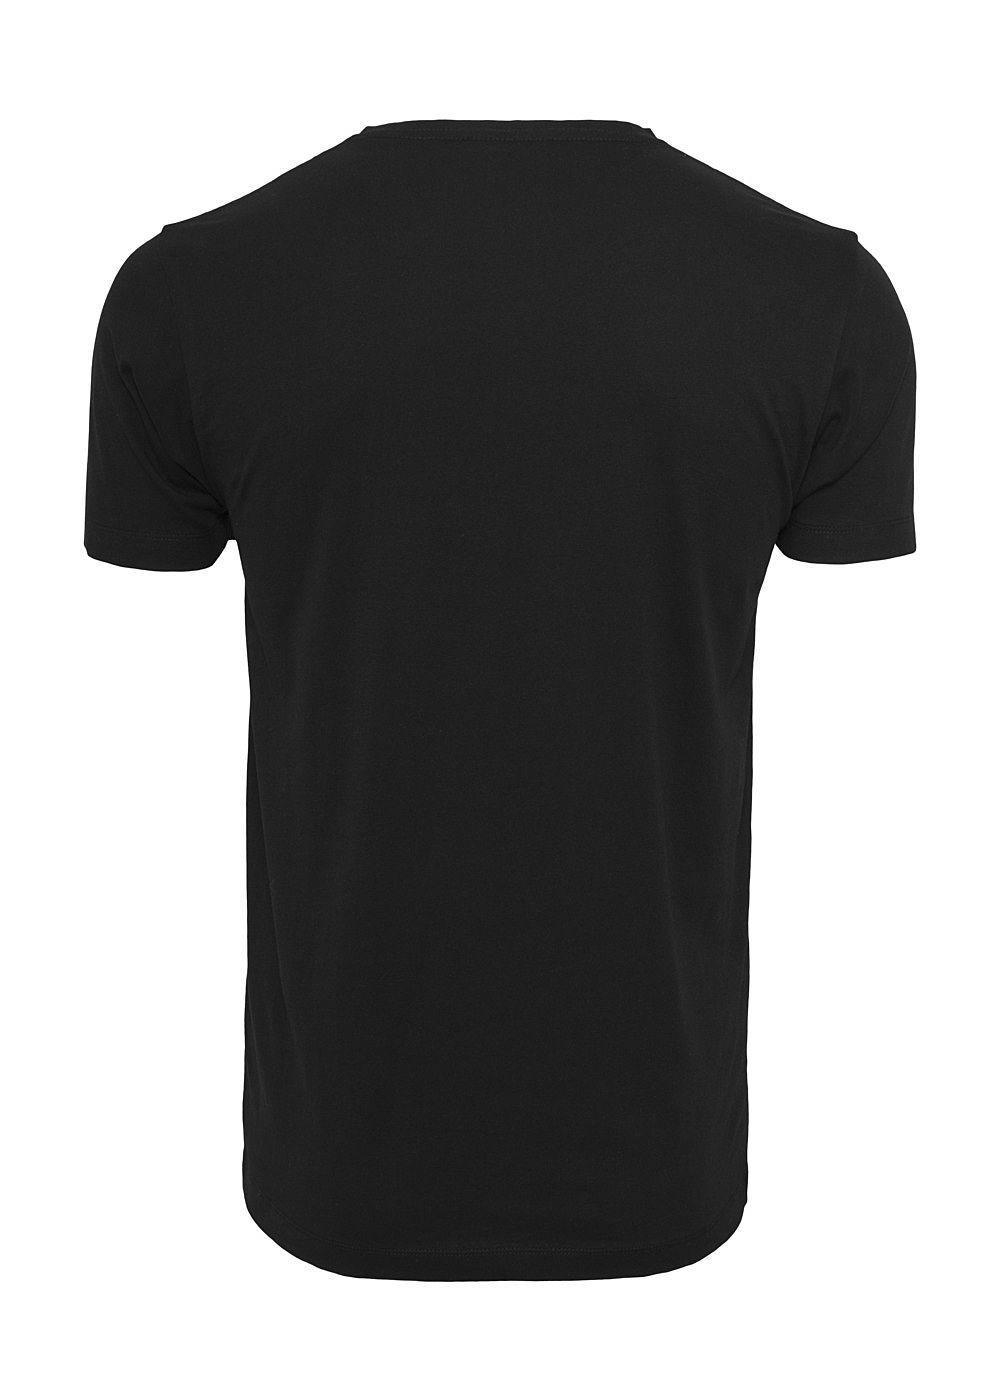 Mister Tee TB Herren T-Shirt Fuck Off Flames Print schwarz -